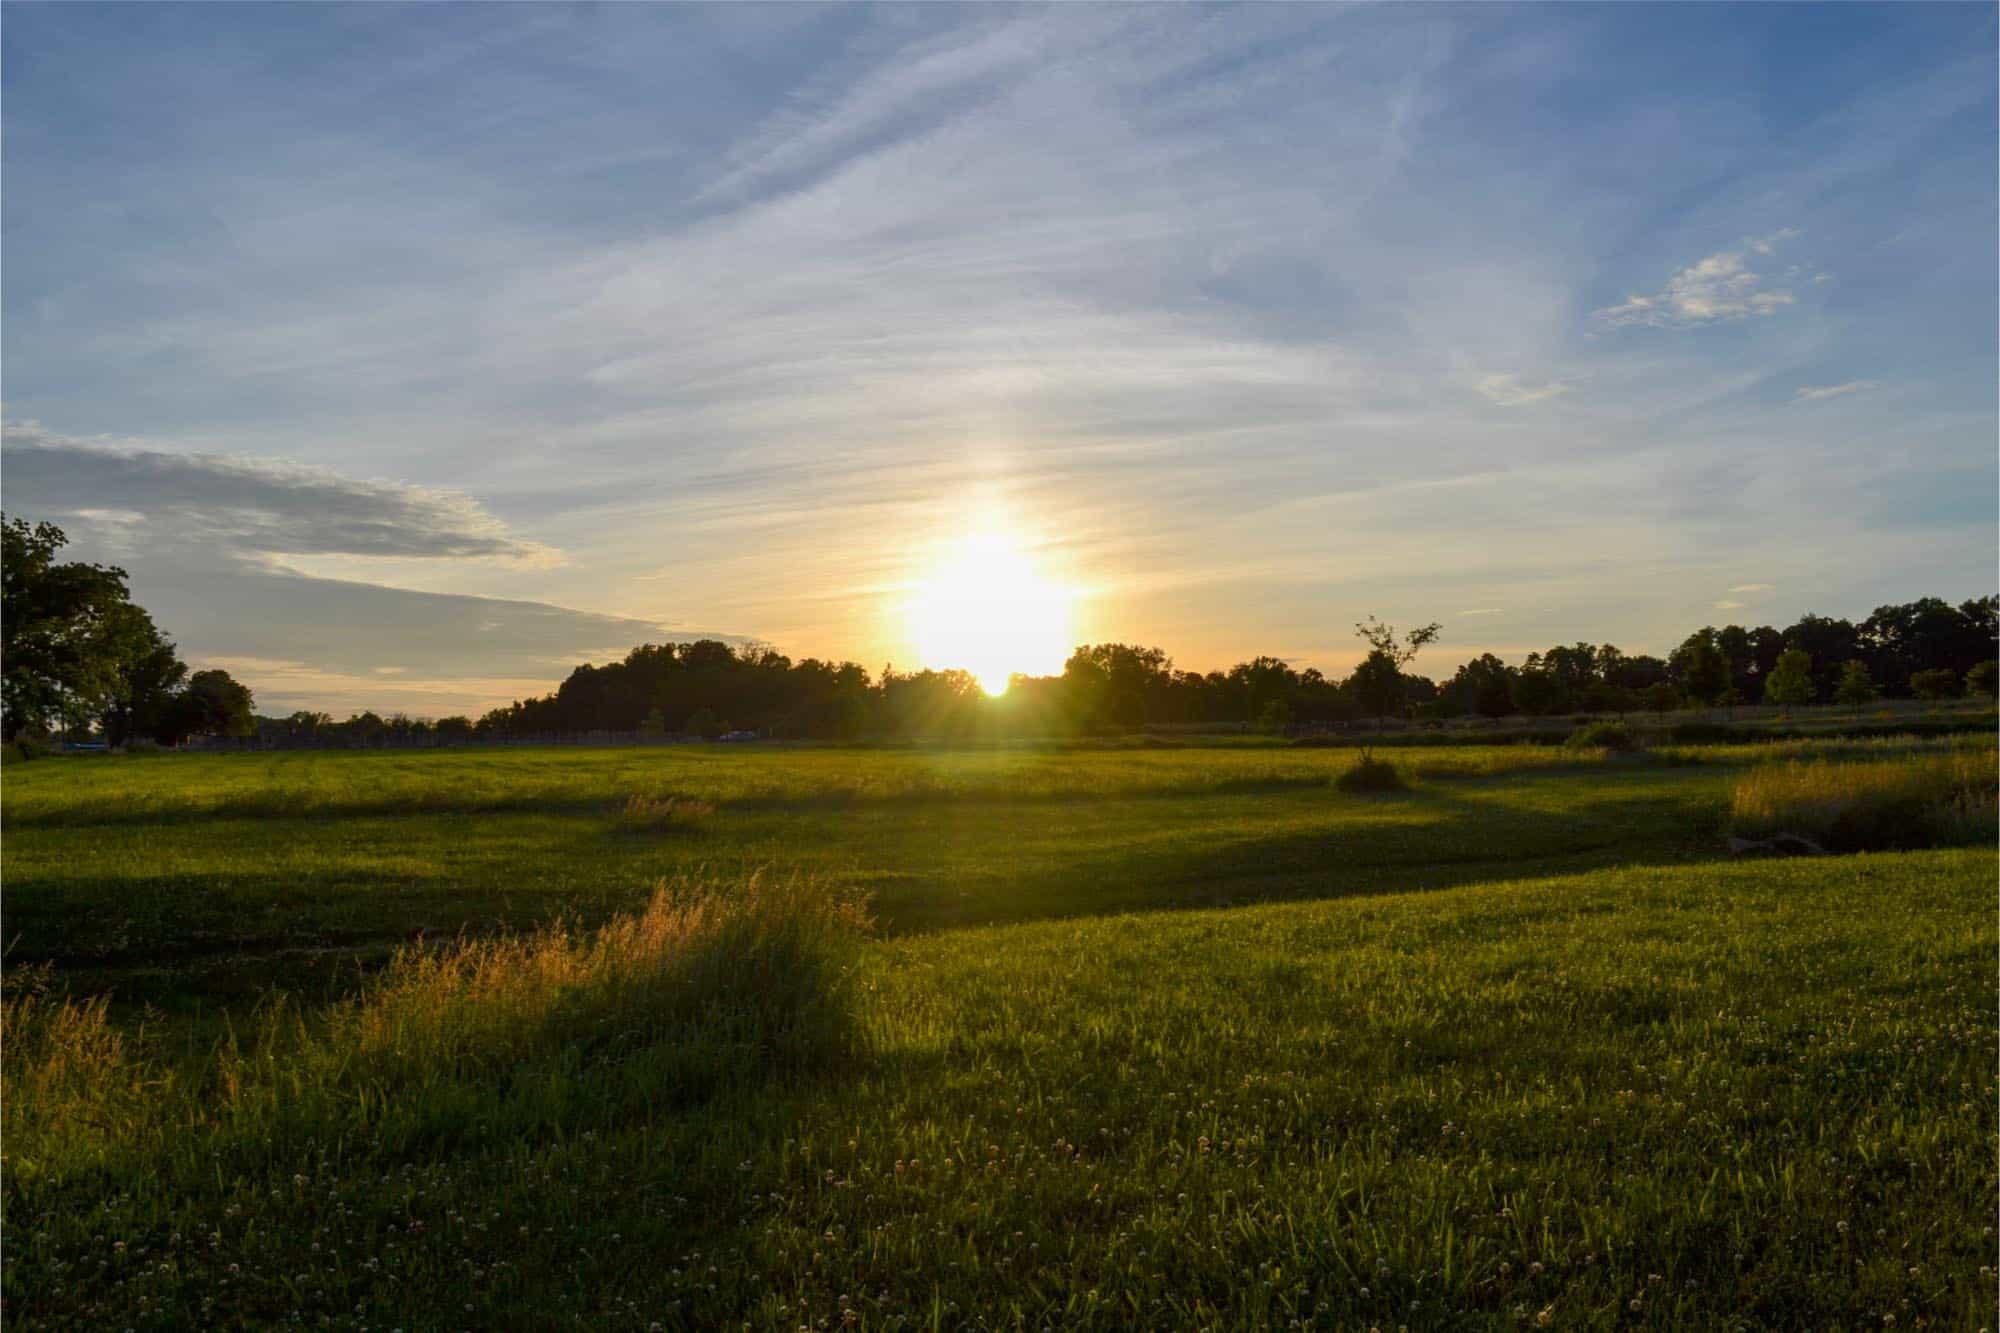 Sunset over a park